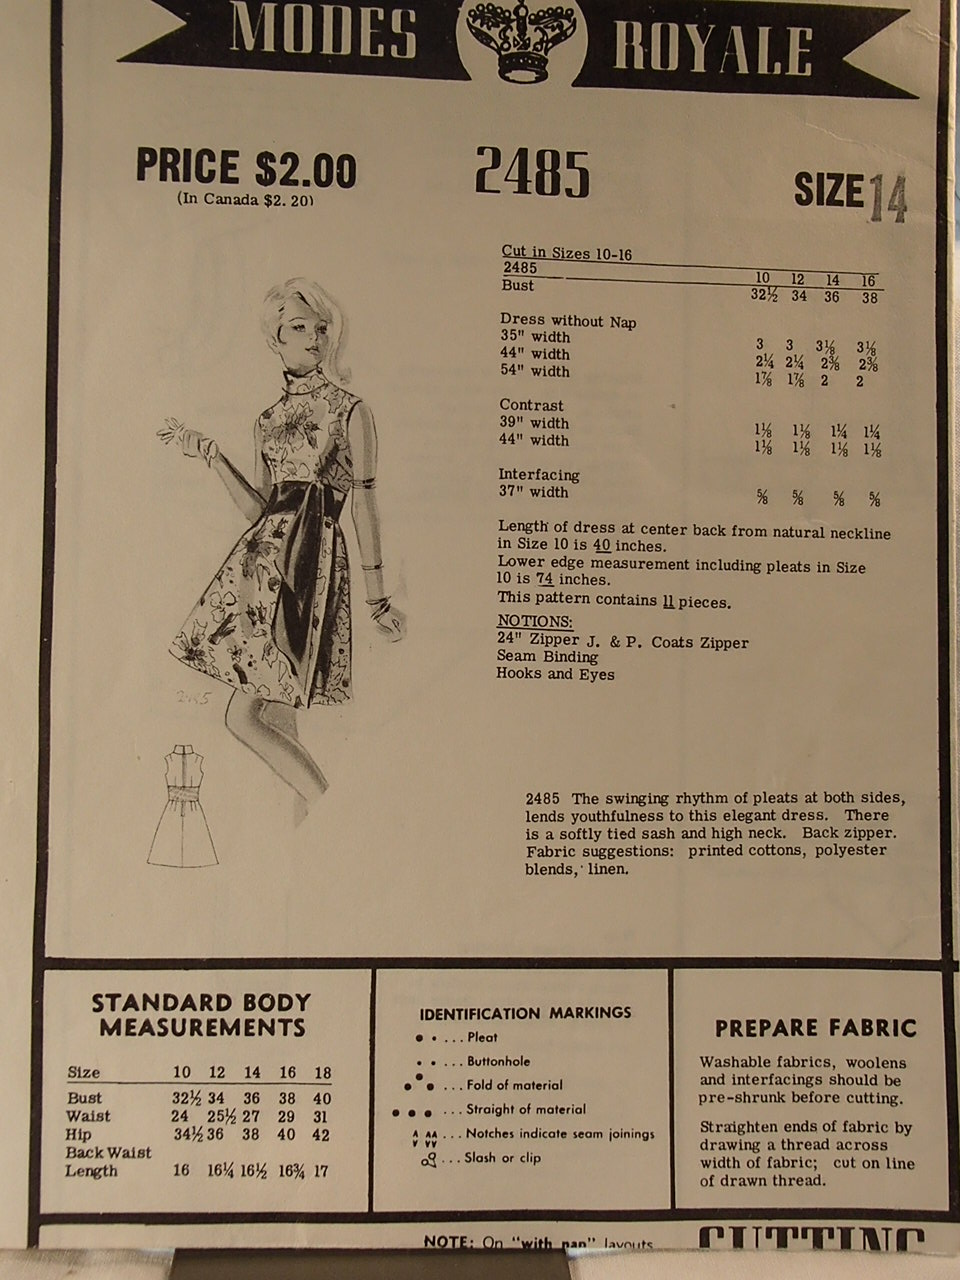 Modes Royale 2485